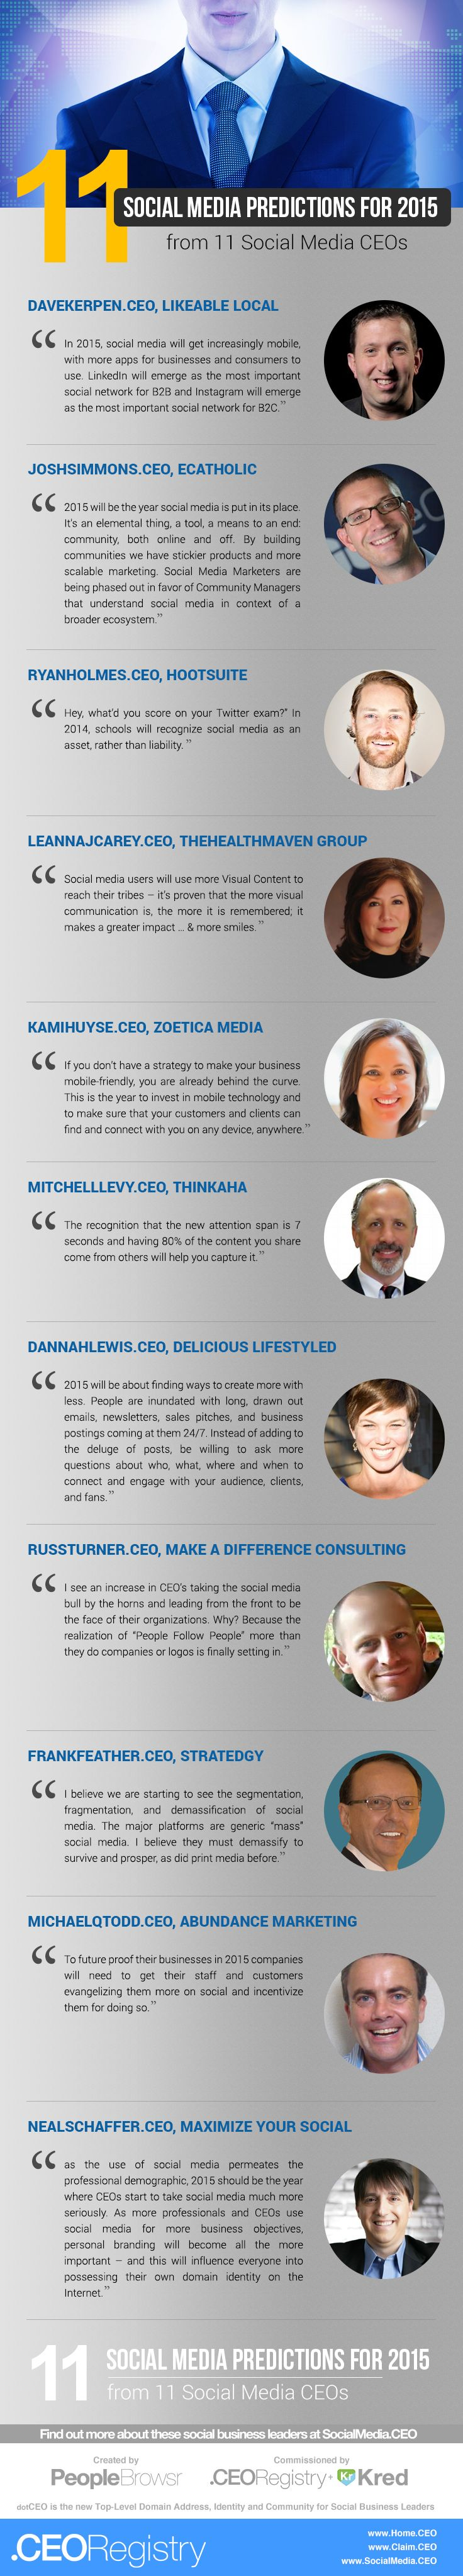 10 social media CEOs give their social media predictions